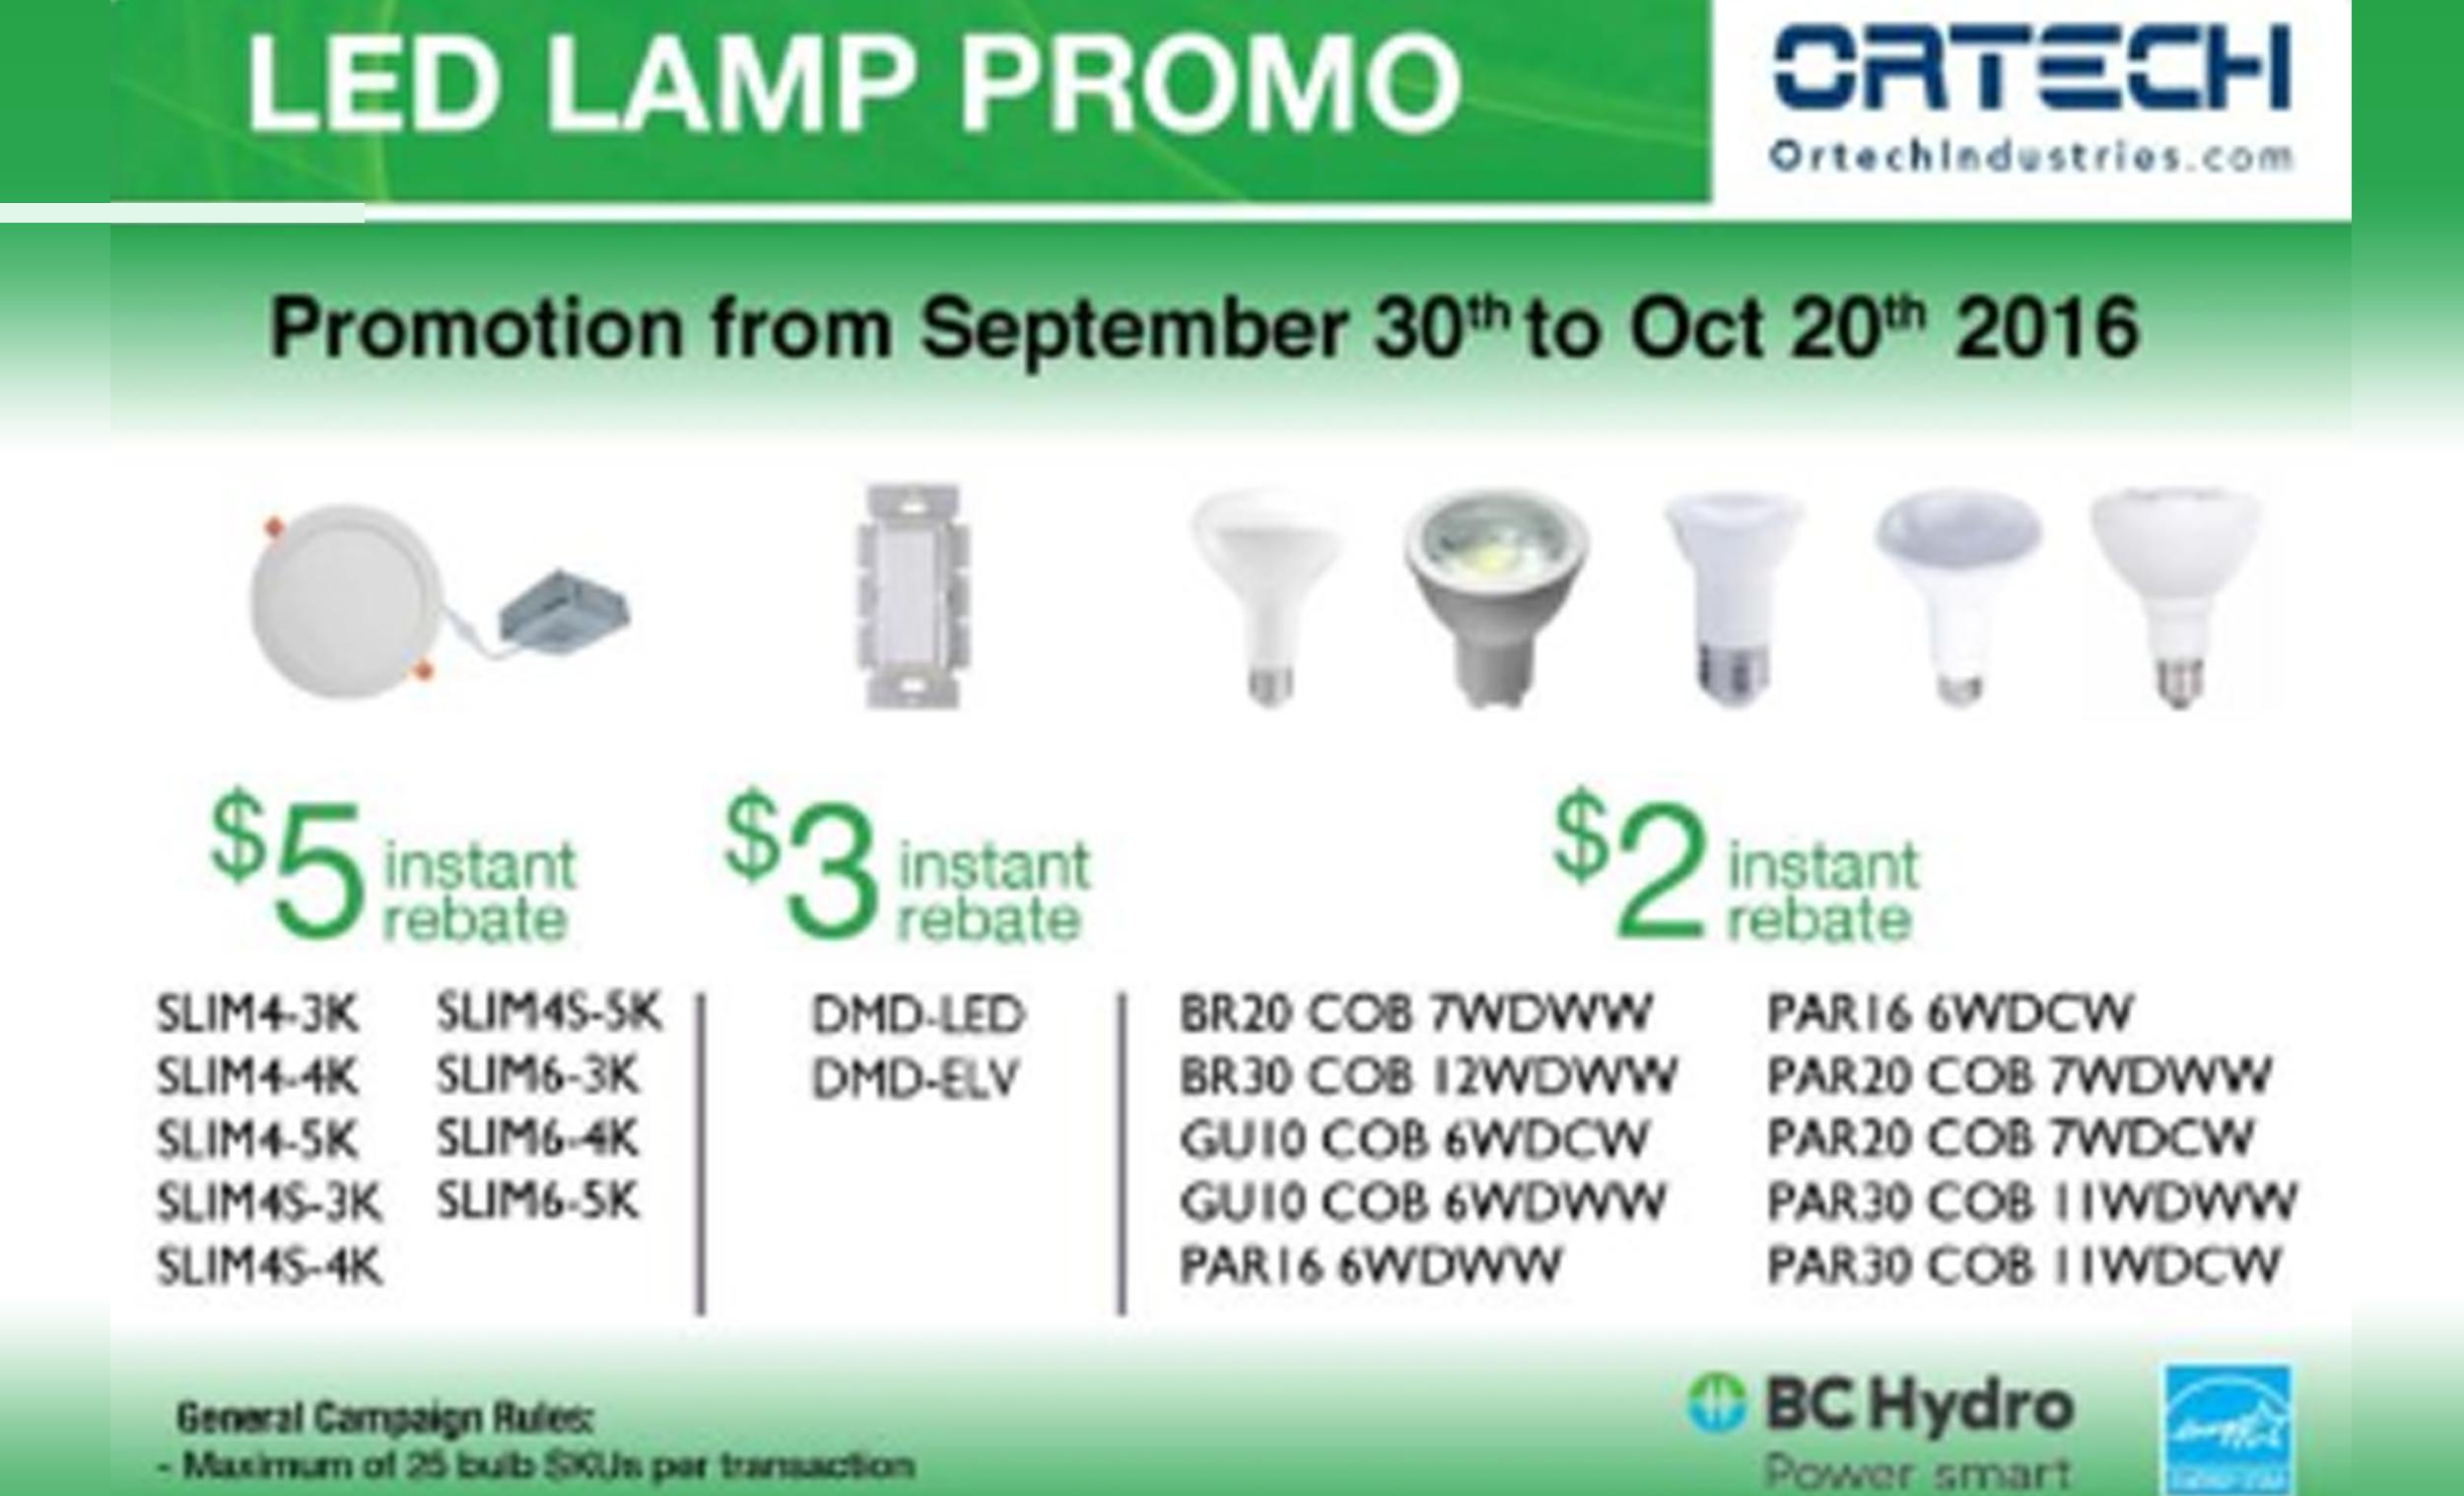 LED Lamp Promo